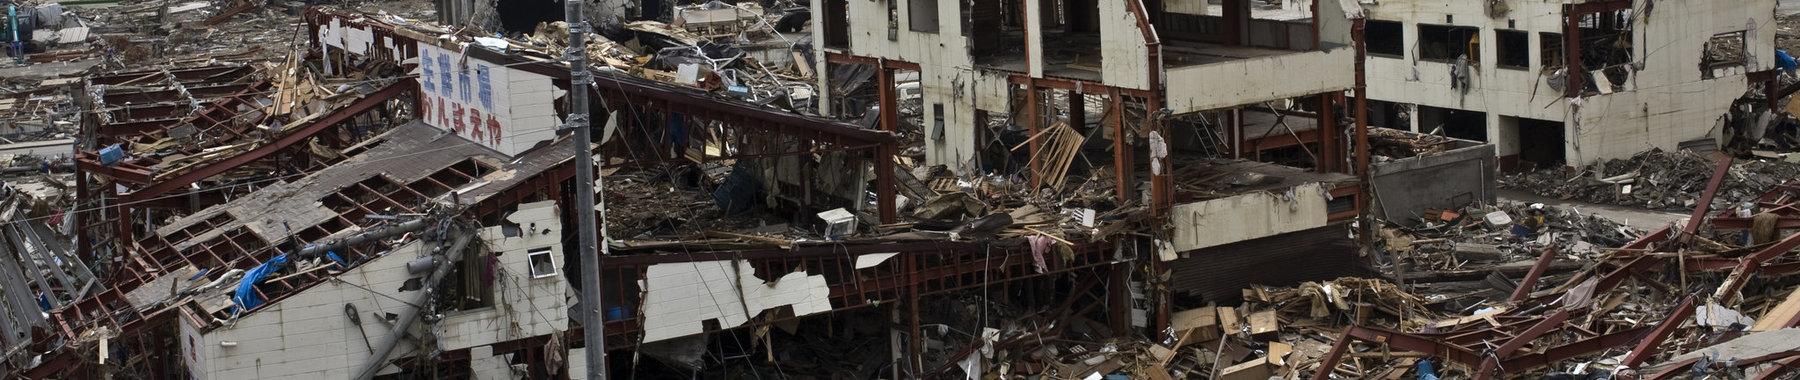 Earthquakes in Japan | Kaggle